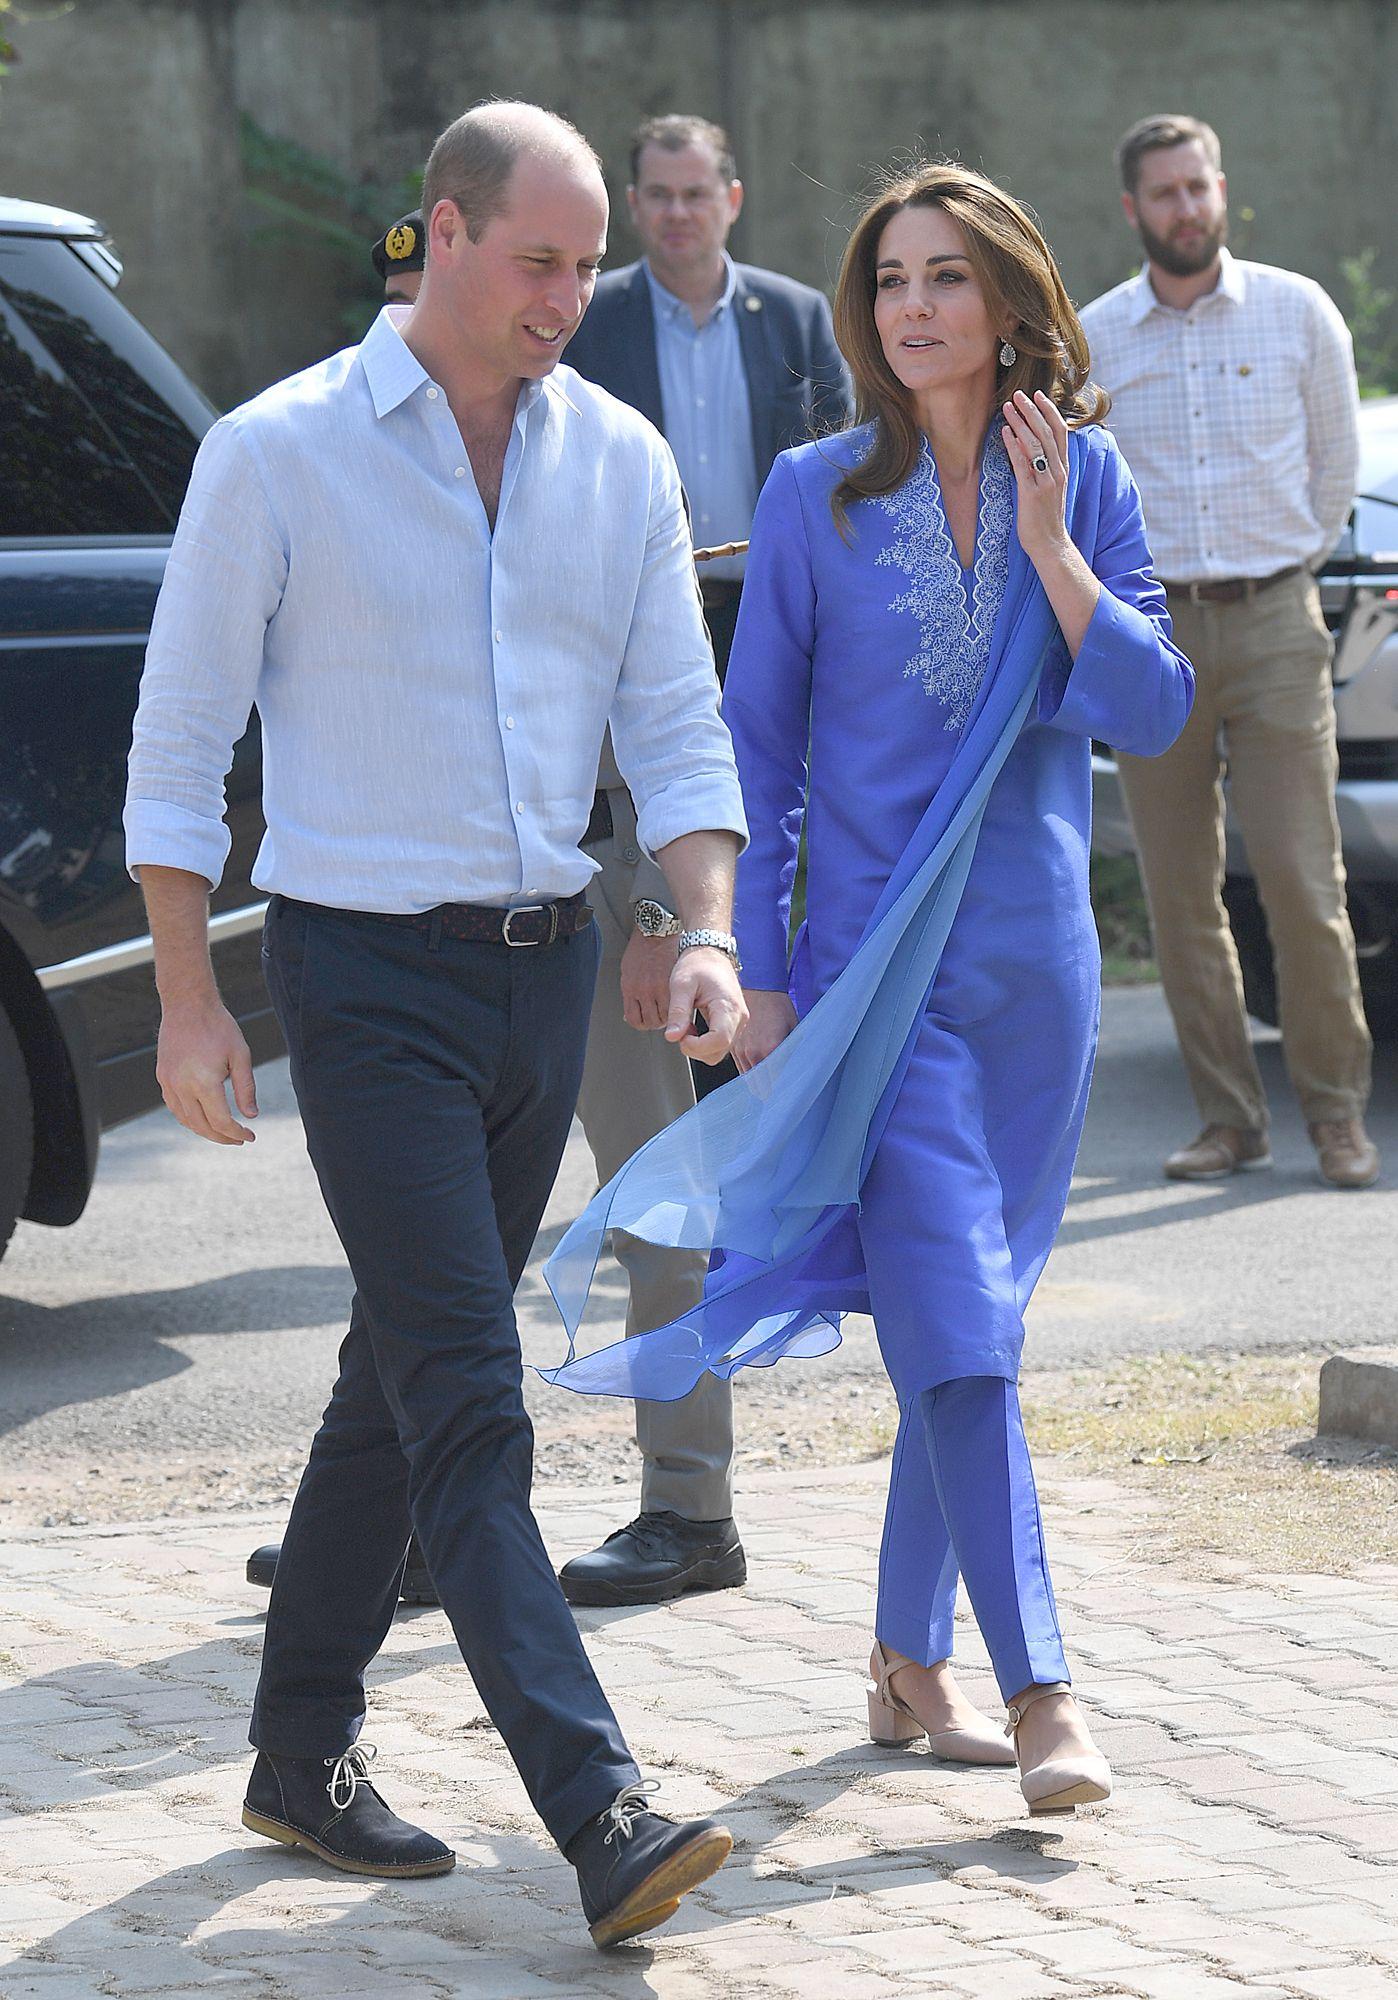 Prince William and Kate Middleton in Pakistan #princessdiana